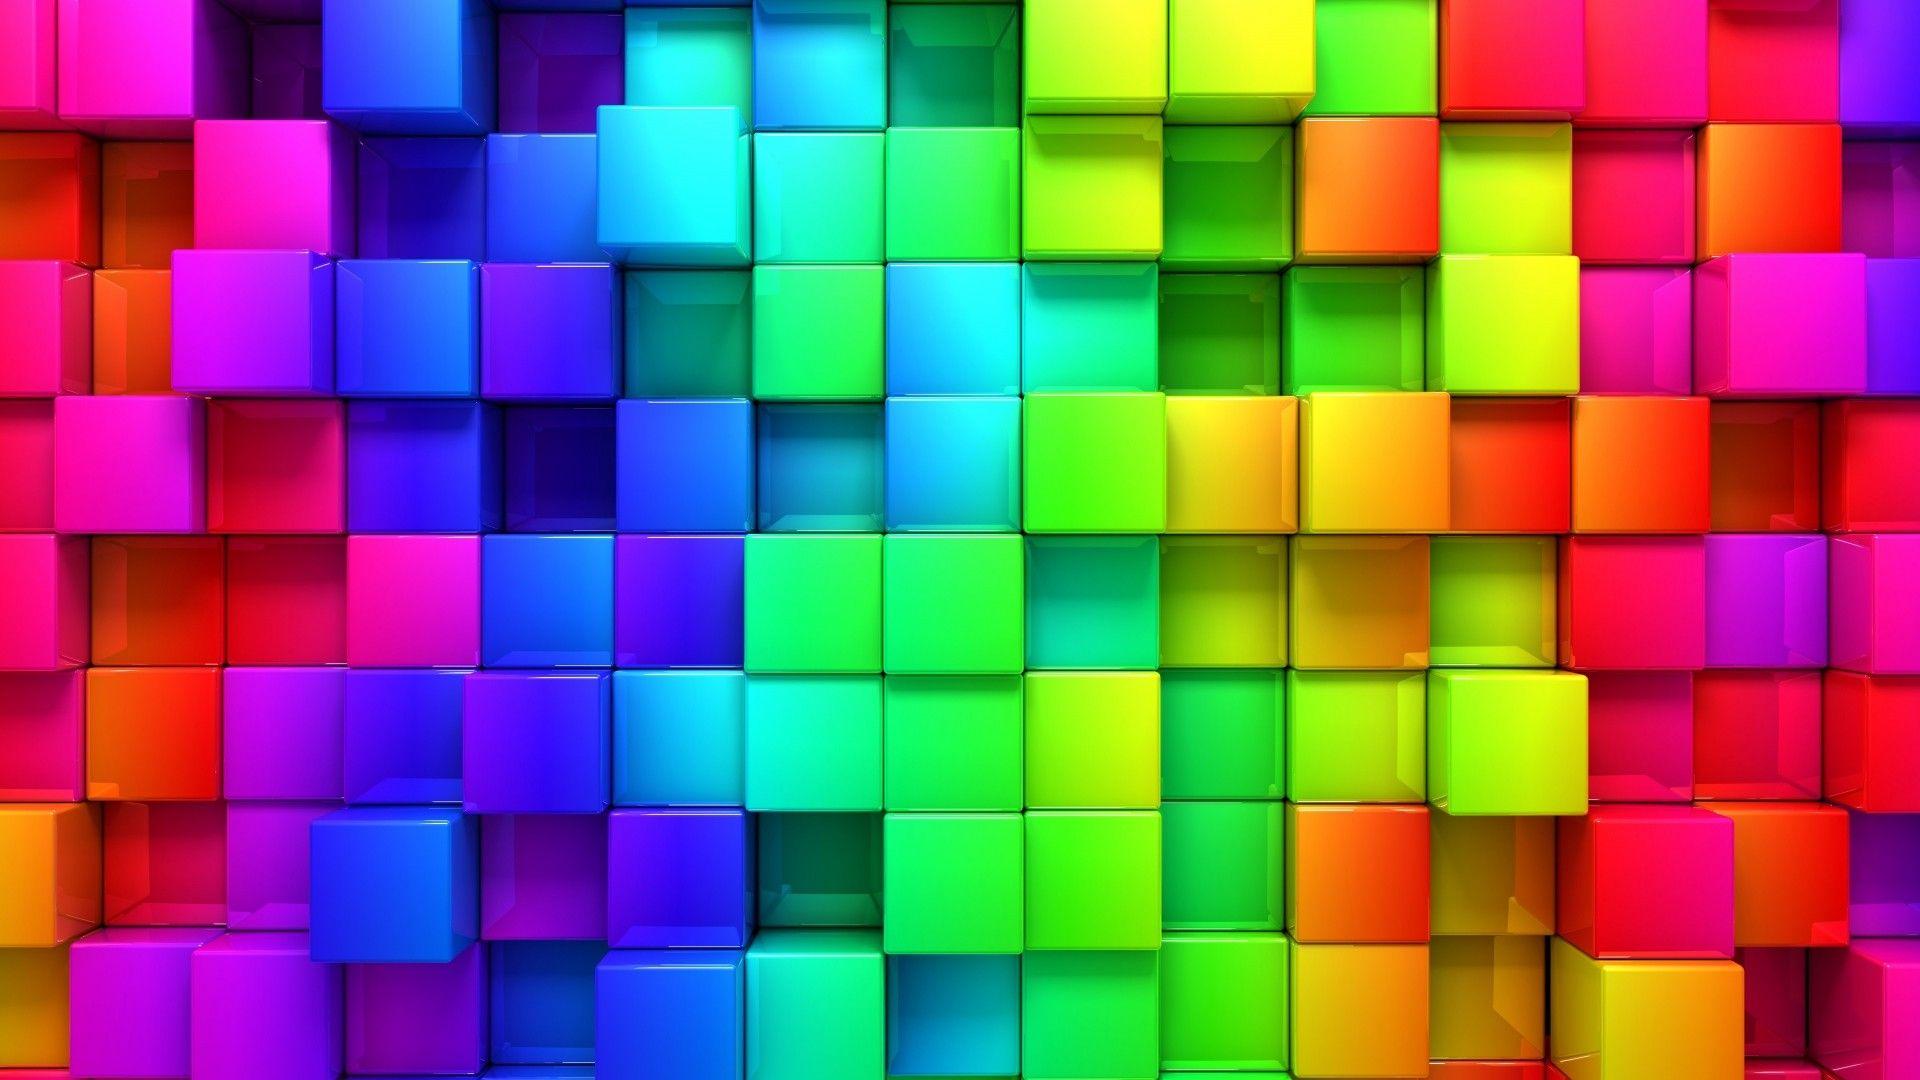 1920x1080 Full Hd 1080p Wallpapers Desktop Backgrounds Hd Android Wallpaper Android Wallpaper Live 3d Cube Wallpaper